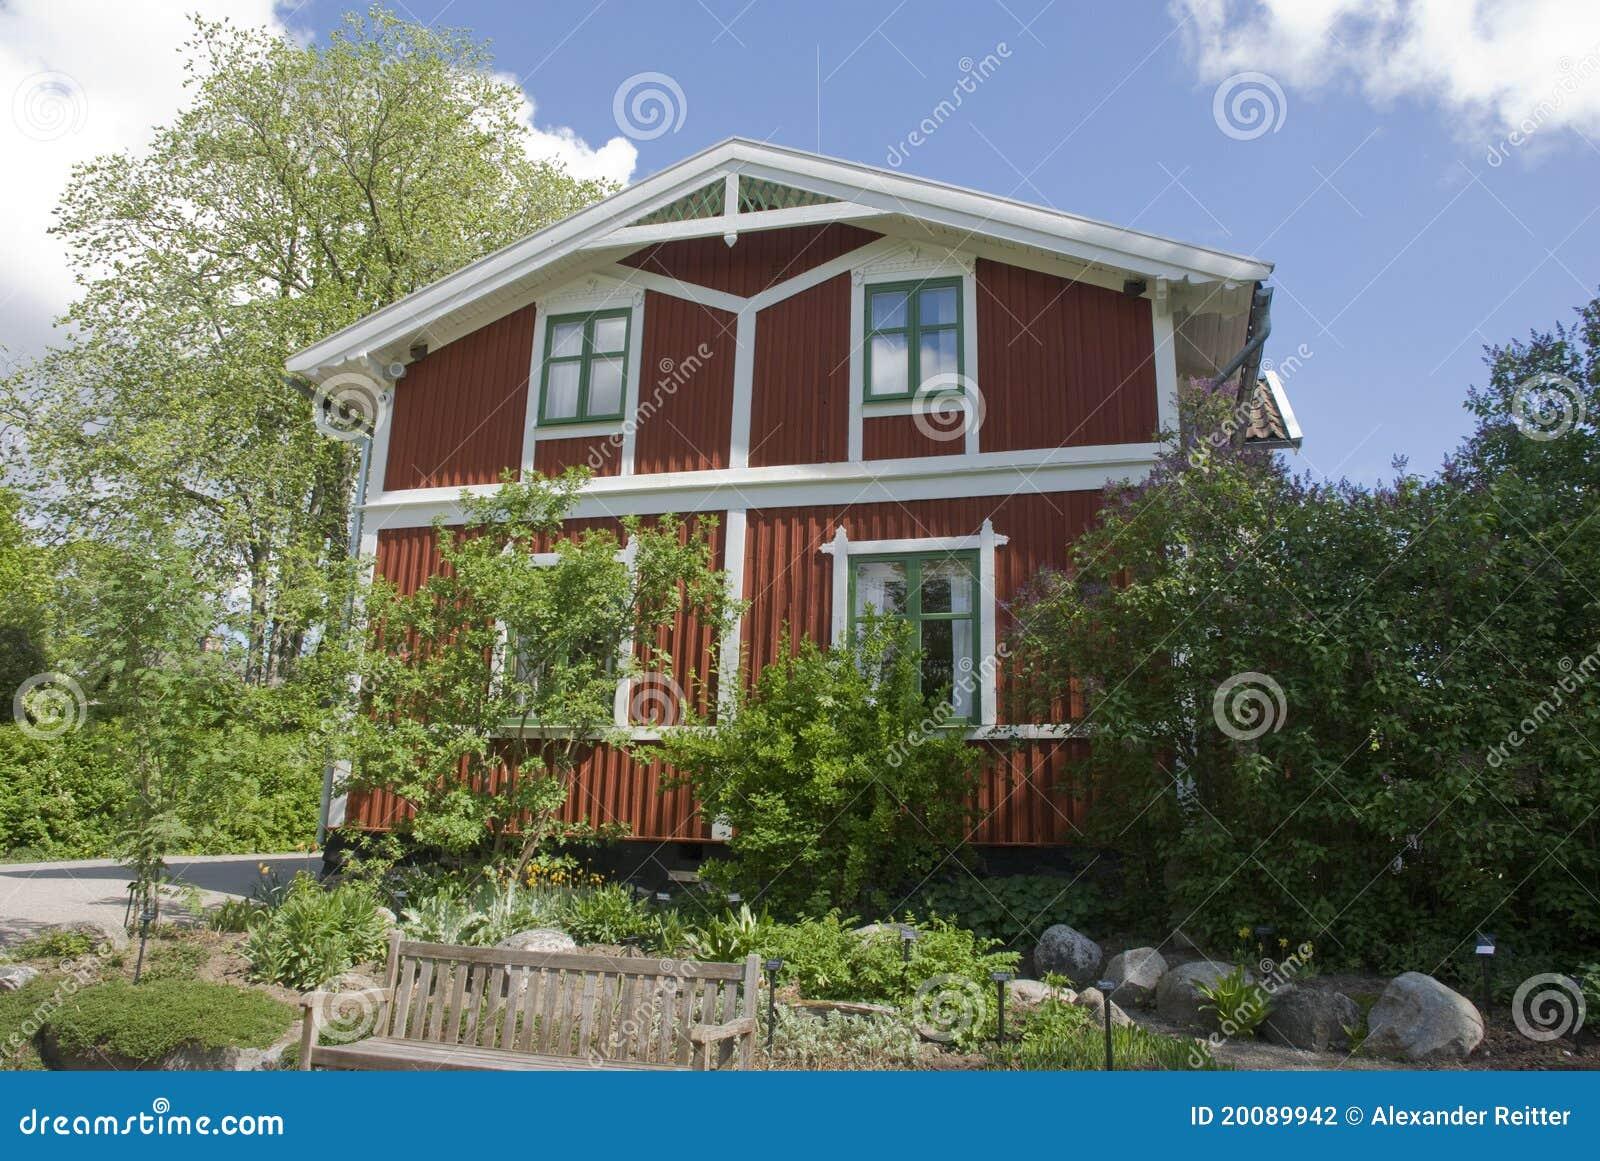 Maison scandinave photographie stock image 20089942 - Maison bois scandinave ...